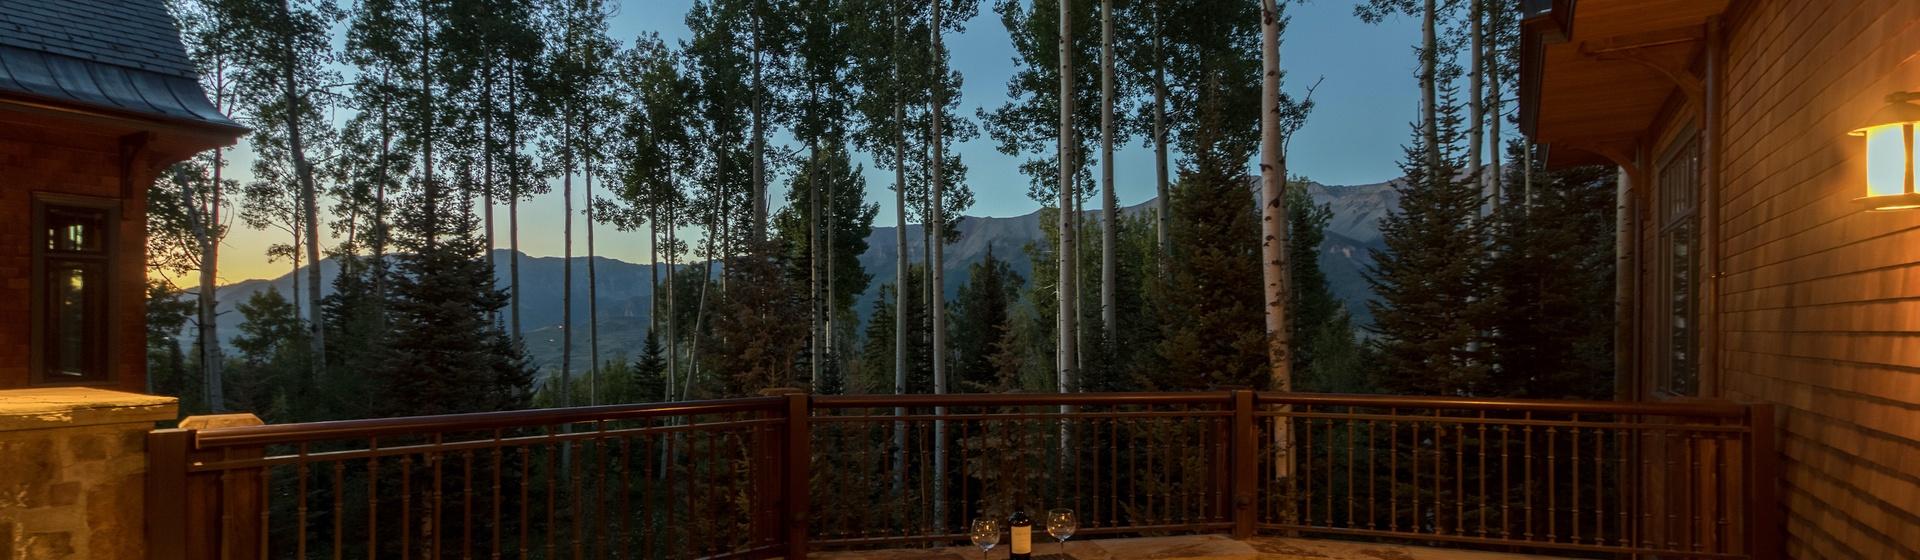 9.06-mountain-village-hood-park-manor-patio-sunset-view-track.JPG